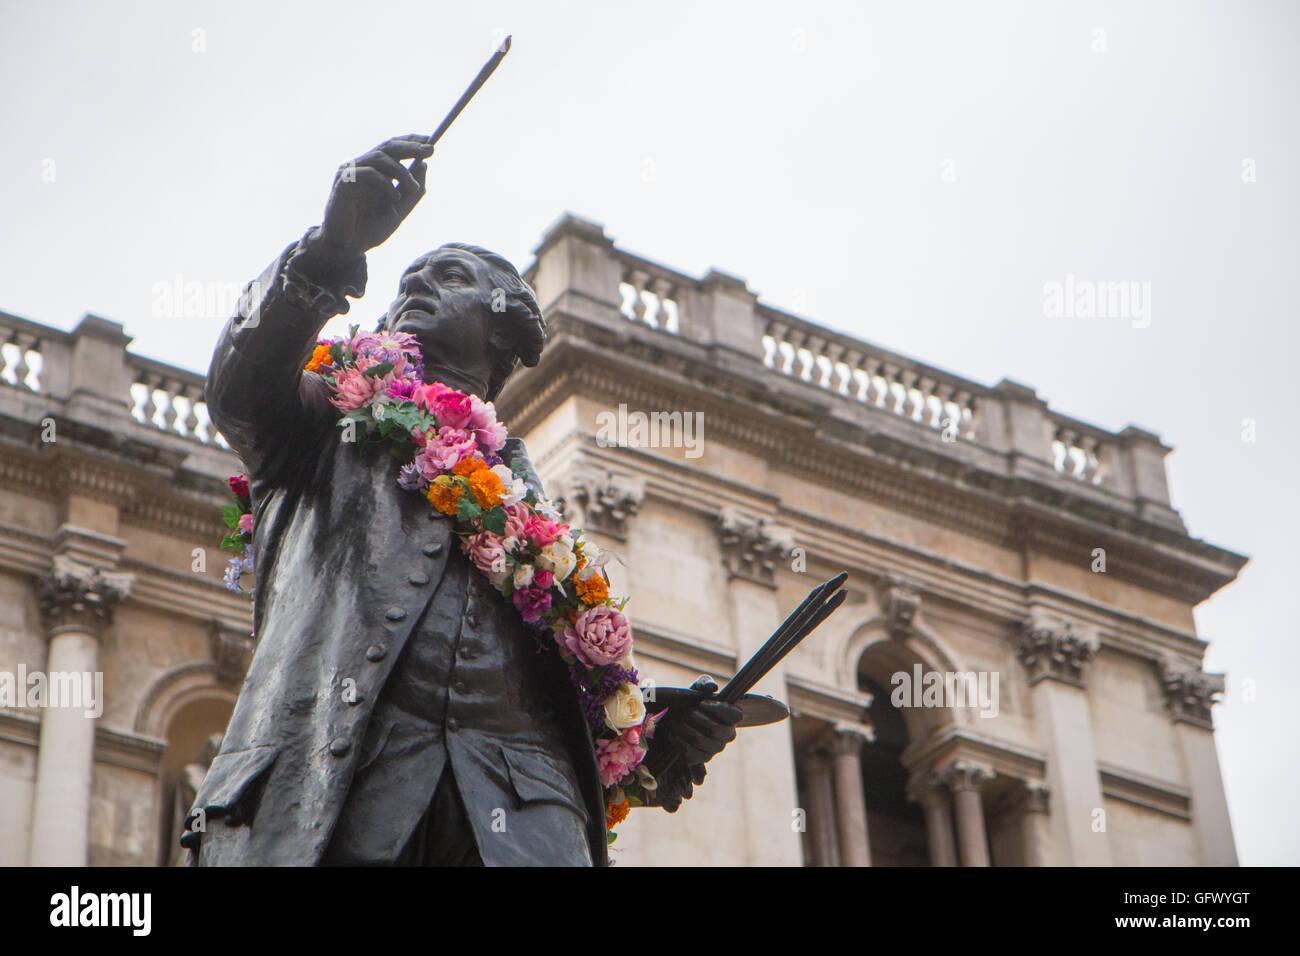 Statue of Joshua Reynolds at Burlington House (Royal Academy) - Stock Image